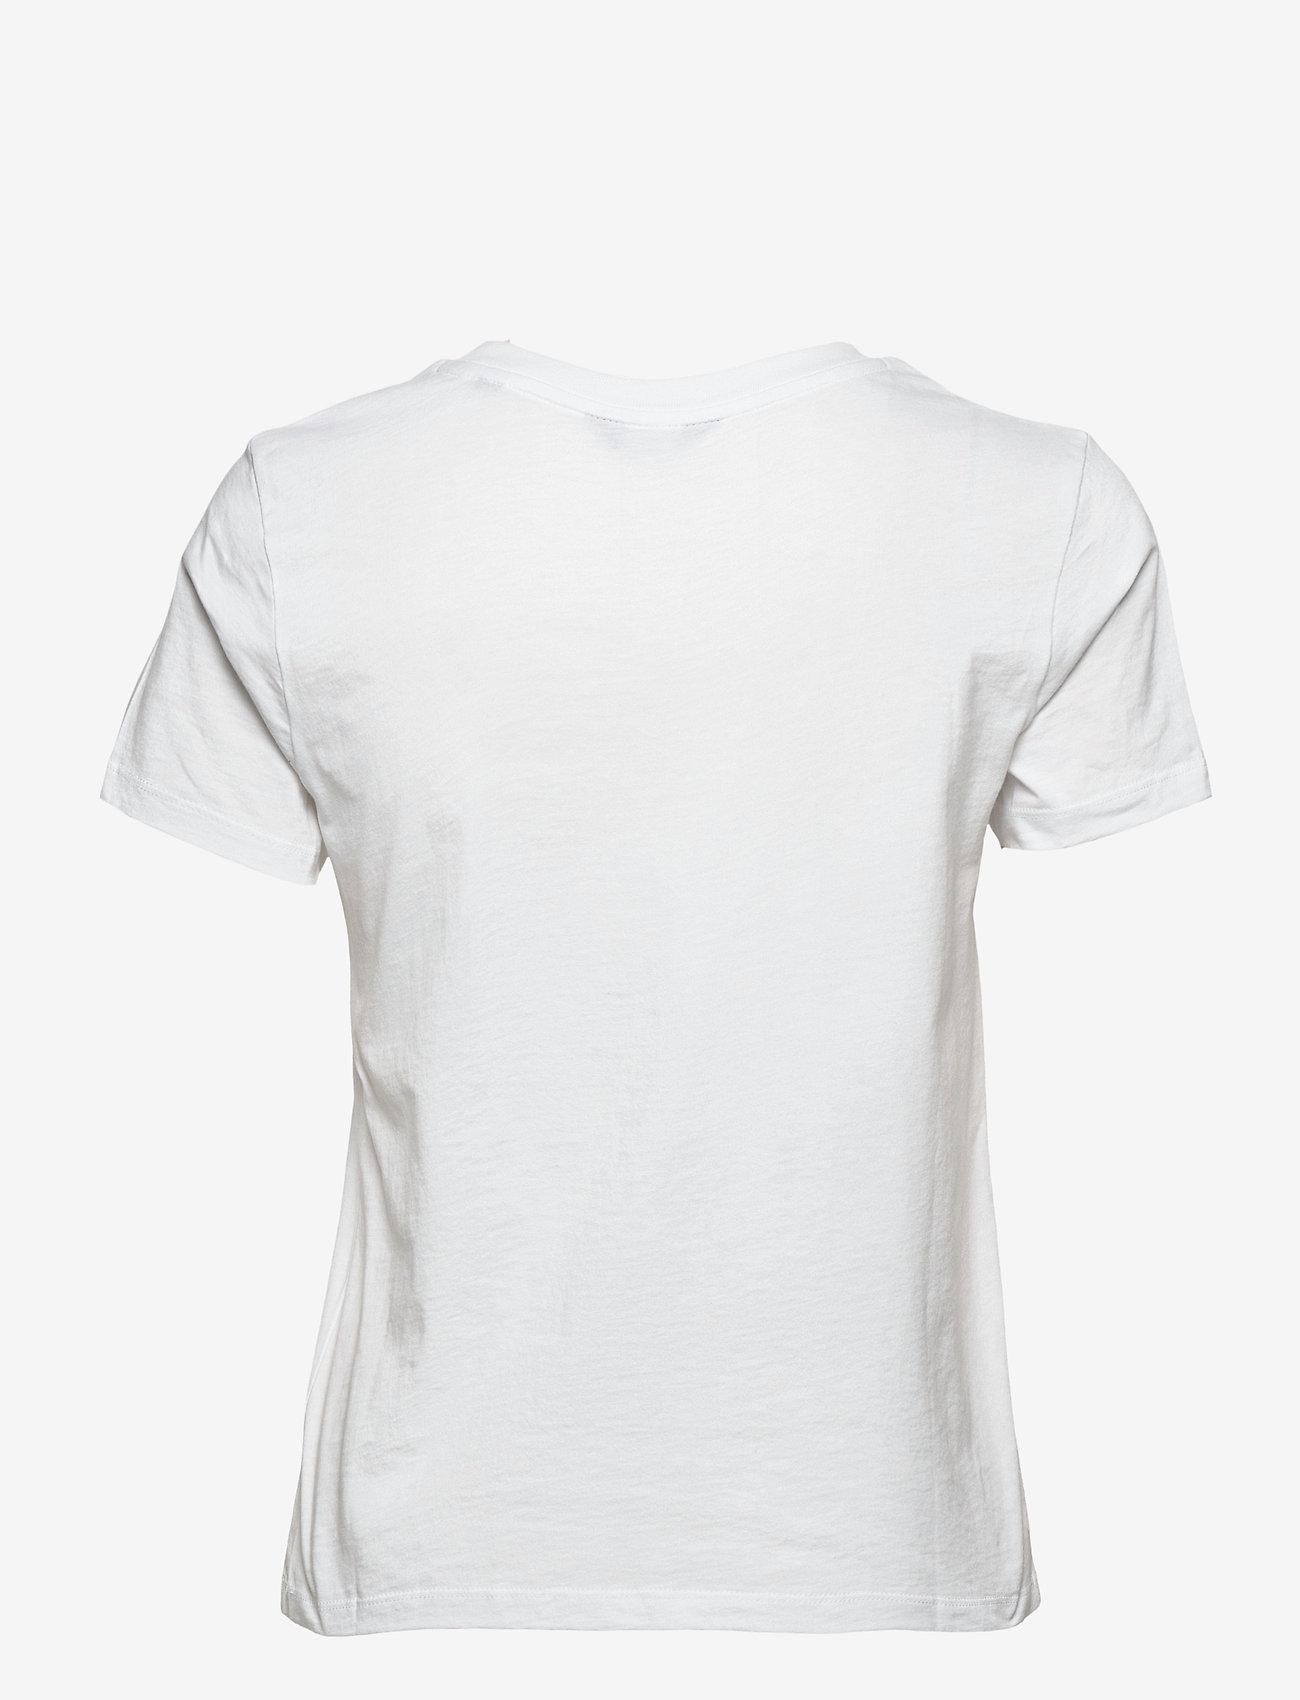 GANT - ARCHIVE SHIELD SS T-SHIRT - t-shirts - white - 1